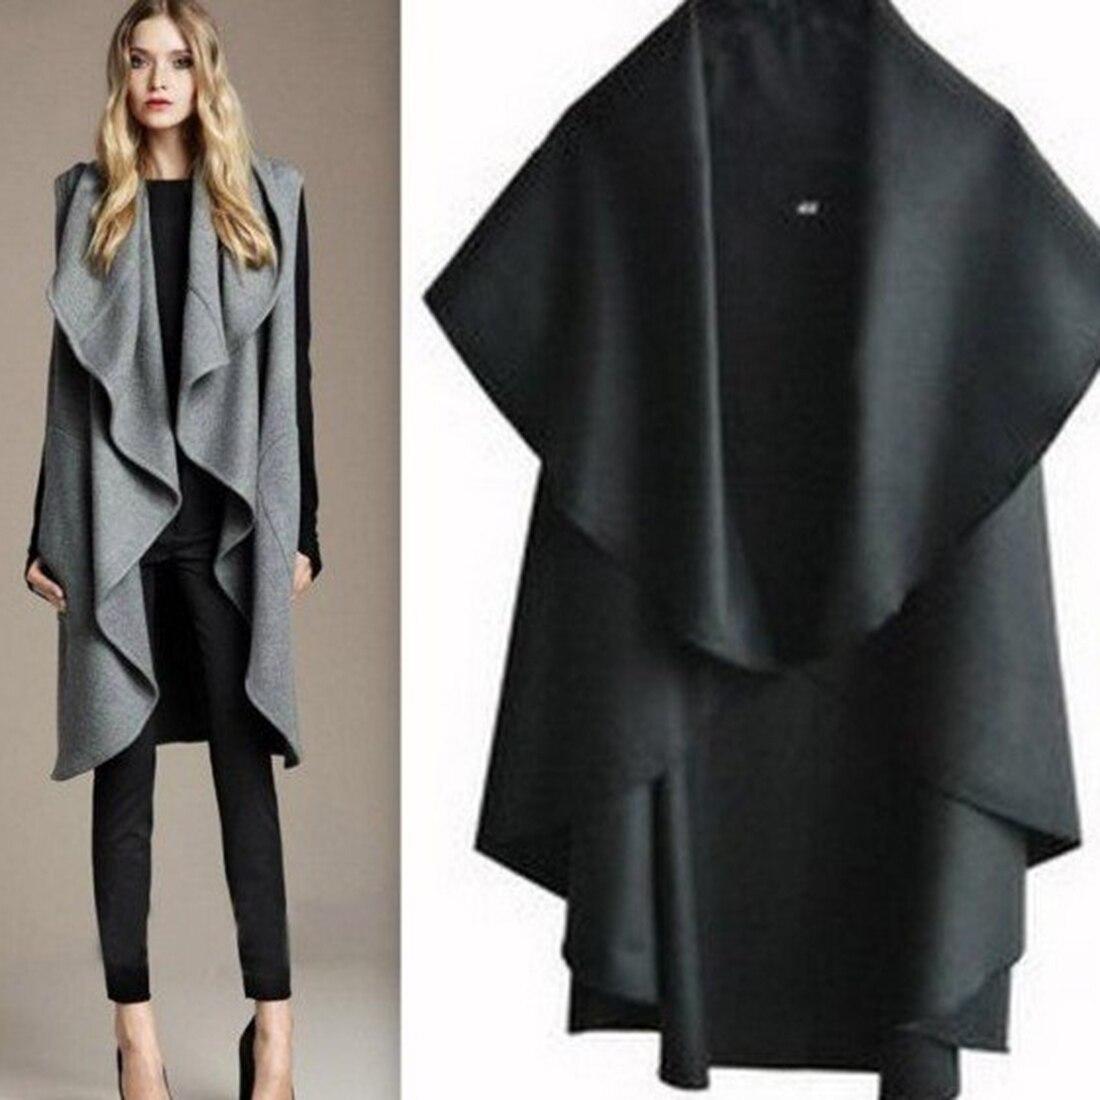 2017 Spring Trendy Coat Cardigan Lapel Irregular Casual Trench font b Jacket b font Solid Outwear